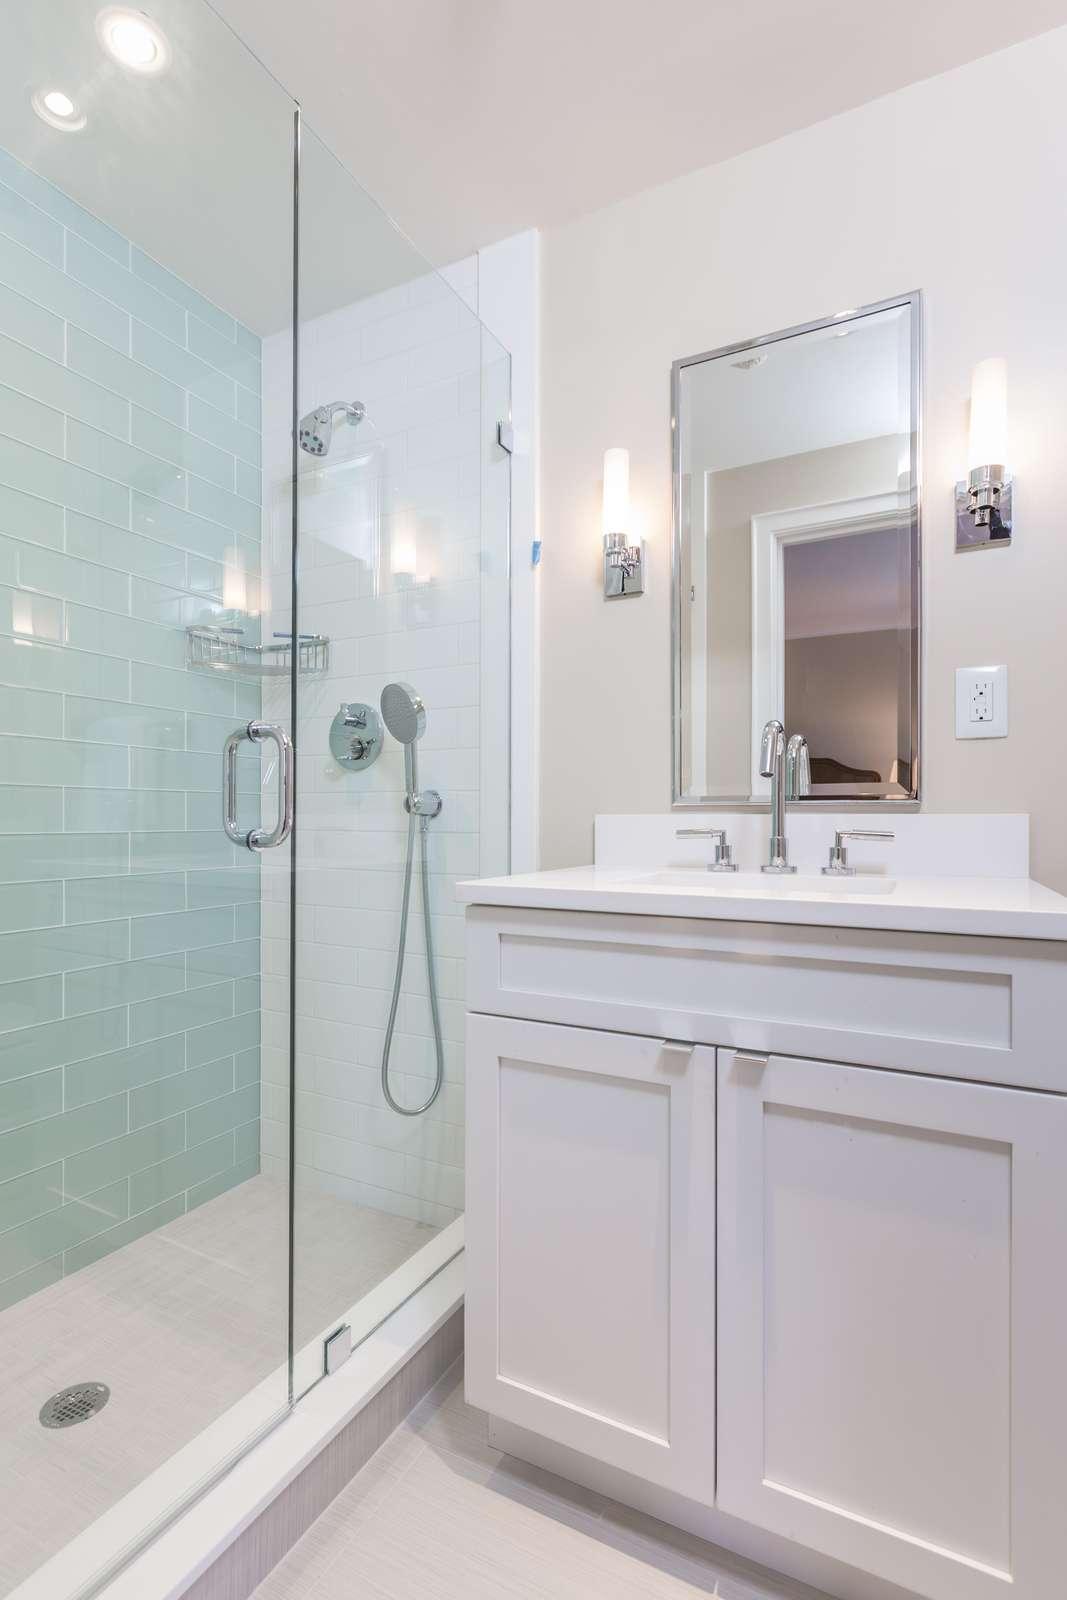 On suite bathroom in 2nd bedroom of 2 bedroom apartment